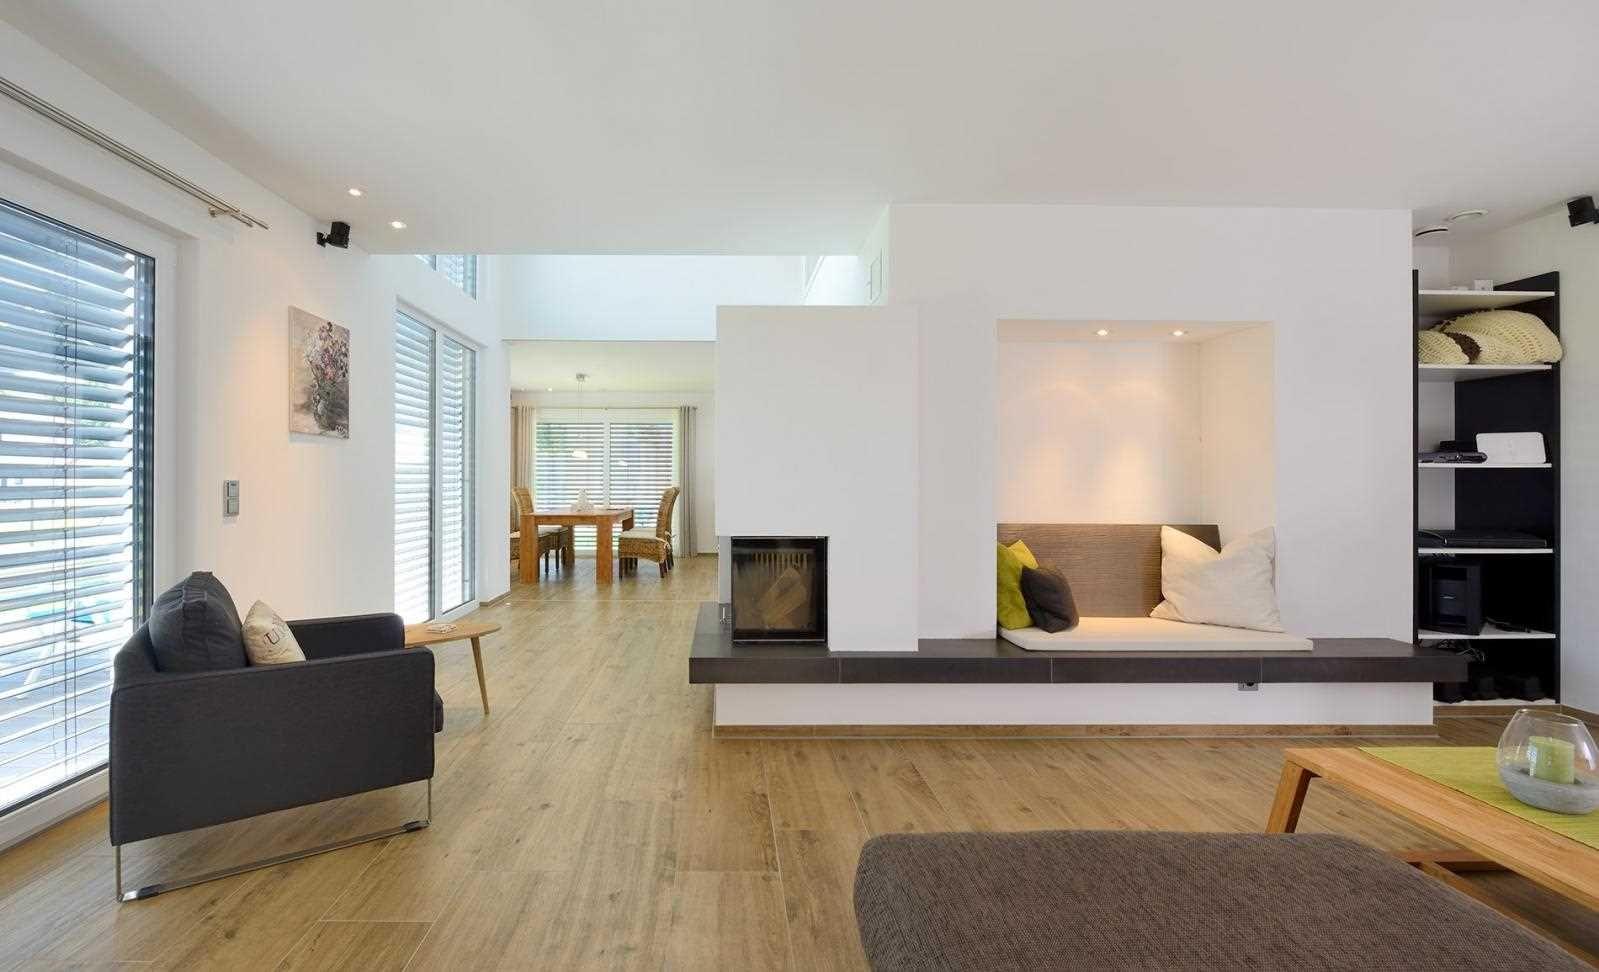 Haus Gaukler  Hausbau  Innen  Pinterest  Interiors Living rooms